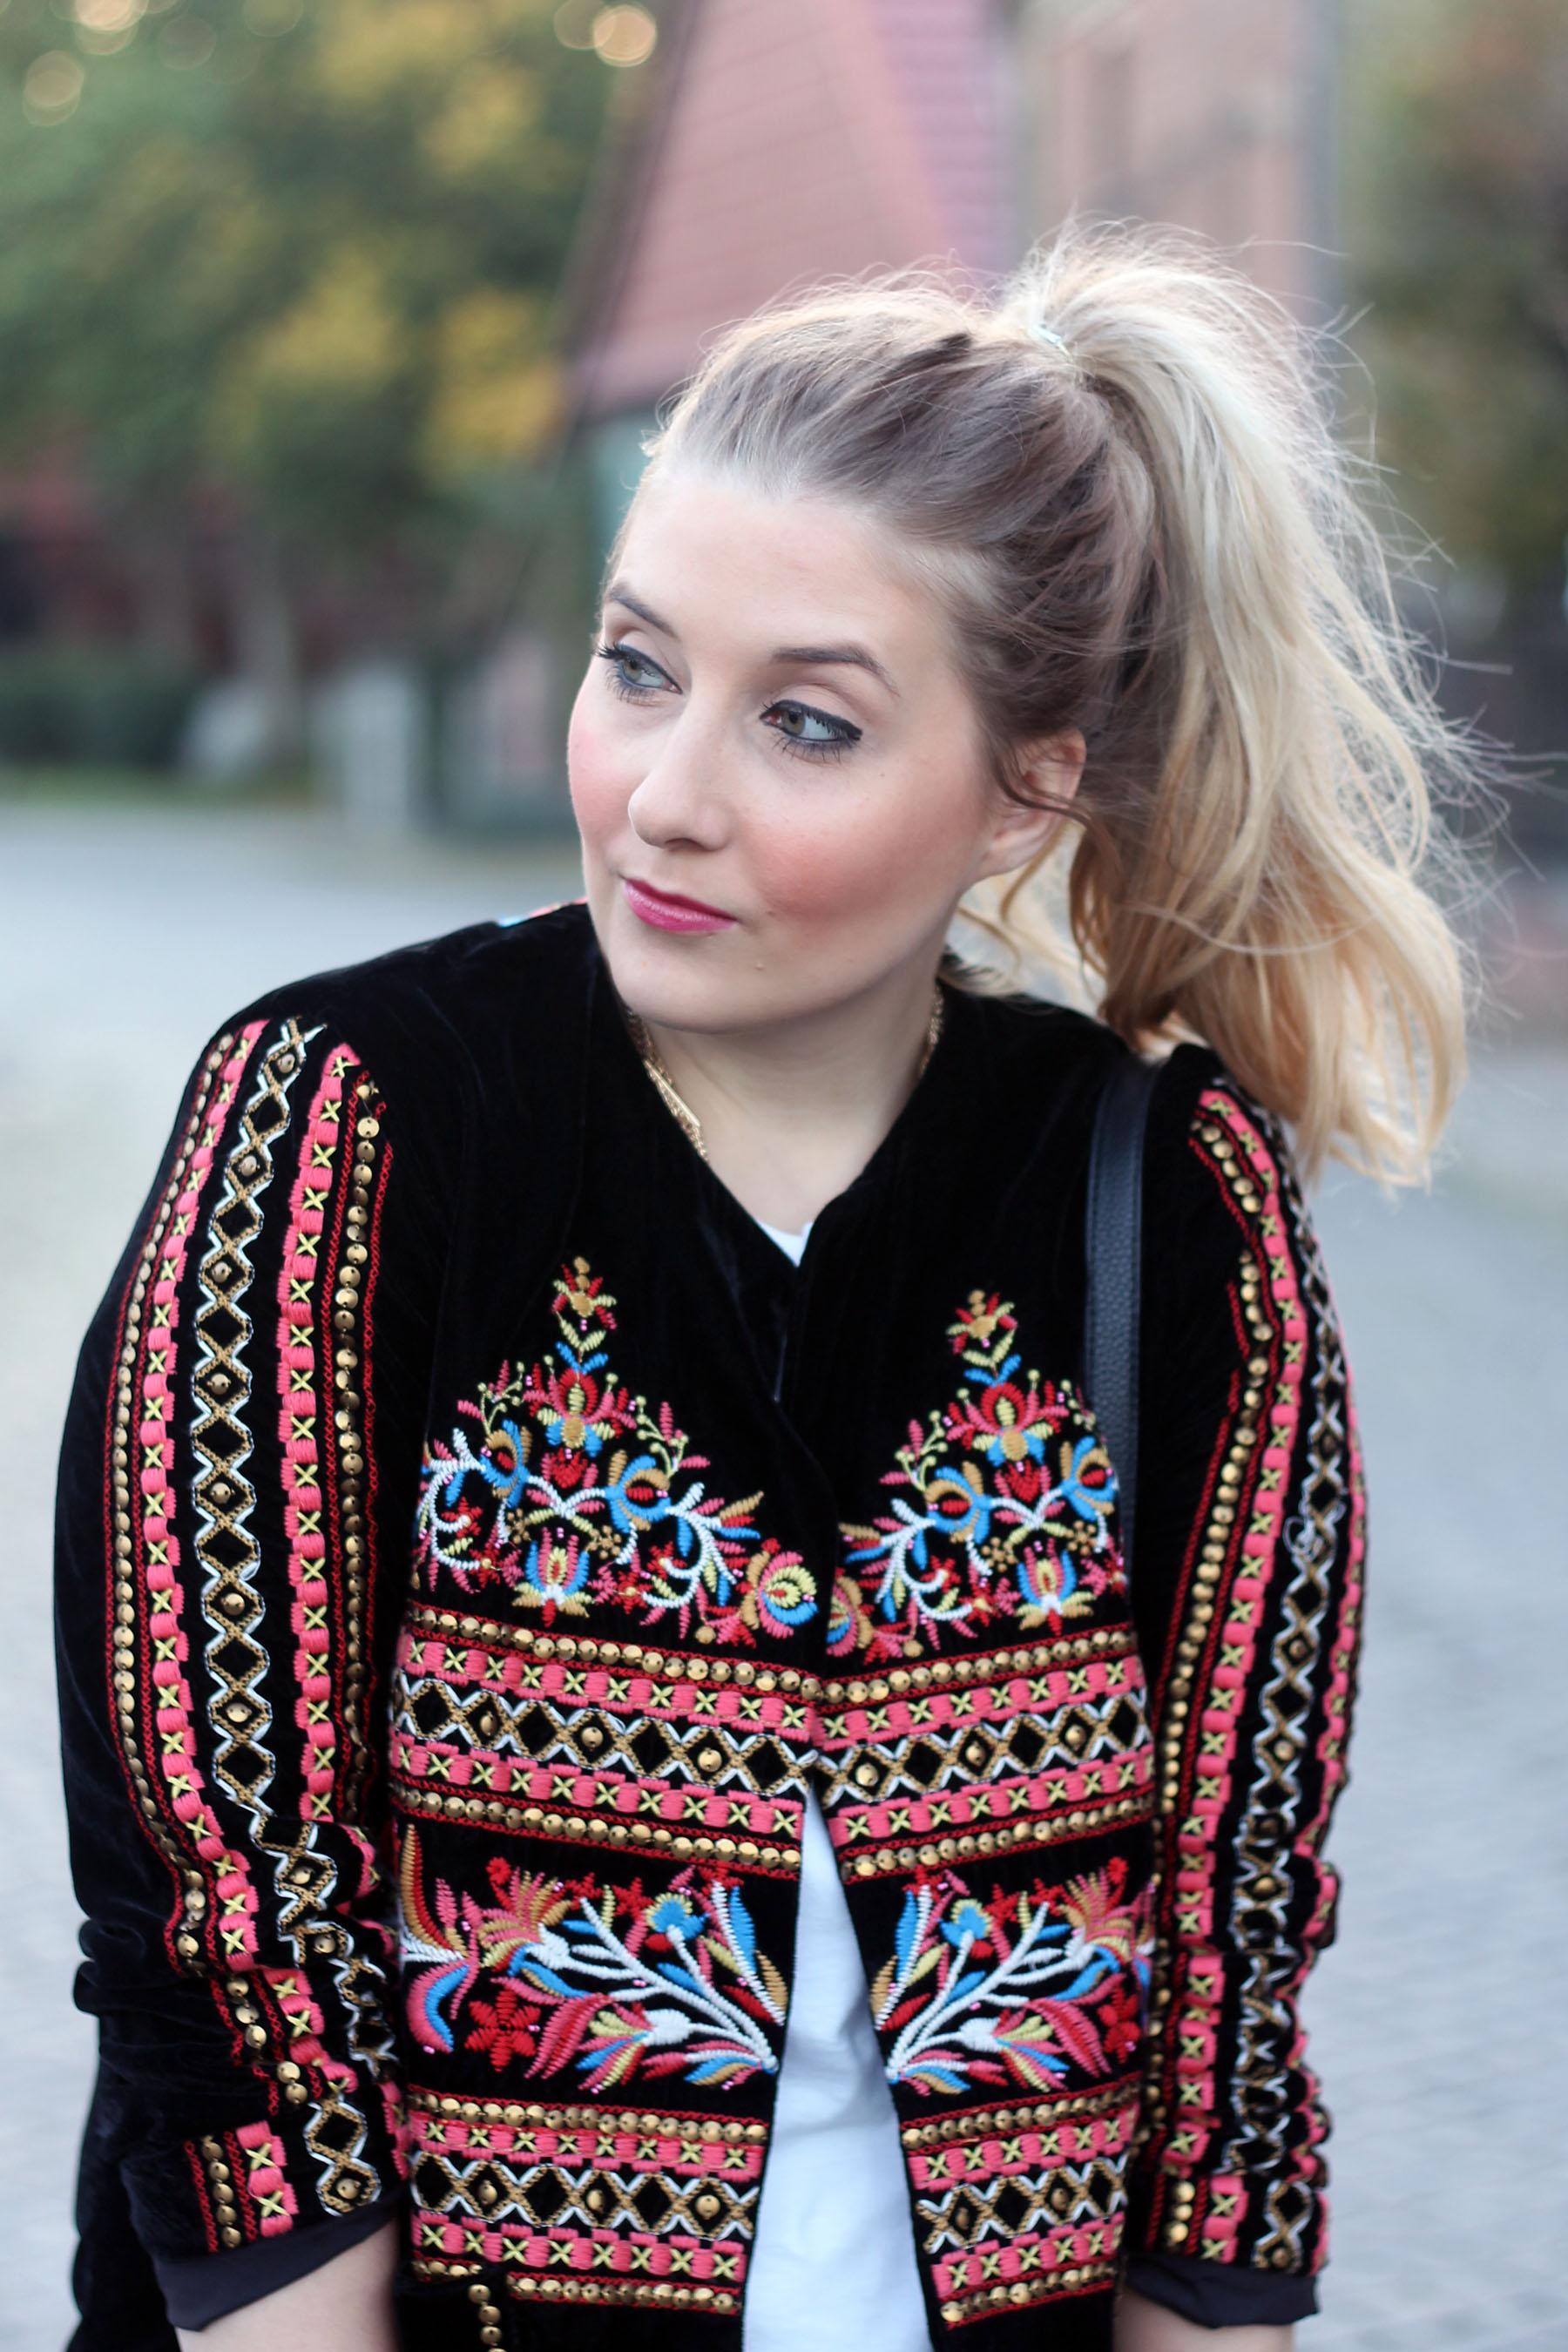 outfit-modeblog-fashionblog-zara-folklore-jacke-trend-style